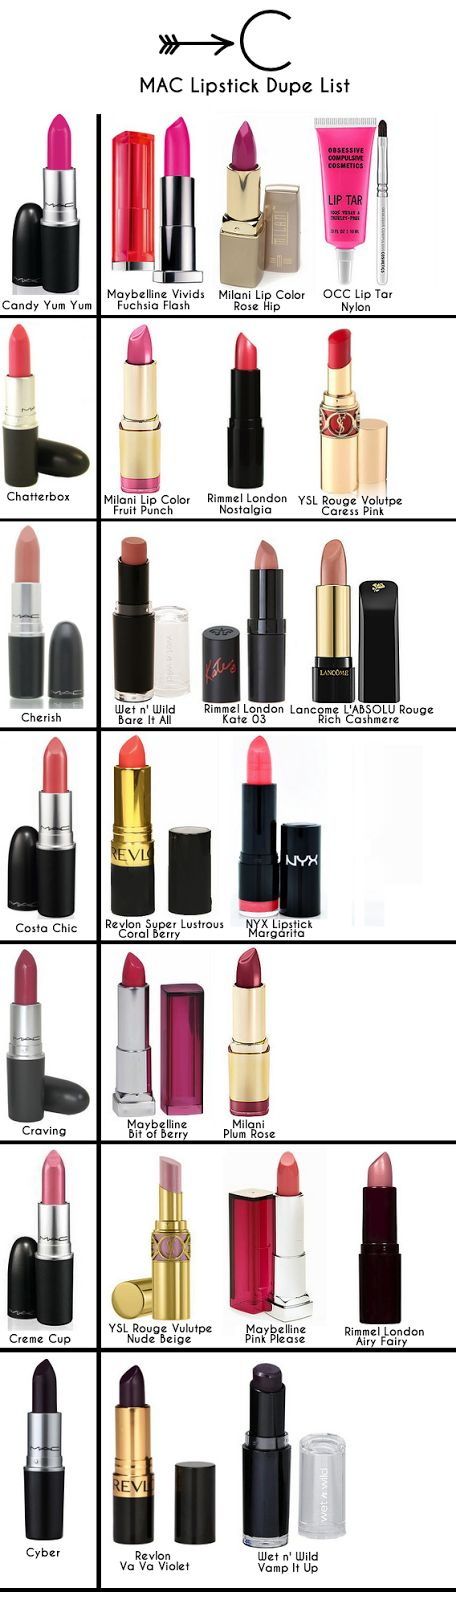 MAC Lipstick Dupes & Alternatives! (Rimmel London, Wet n Wild, etc.)